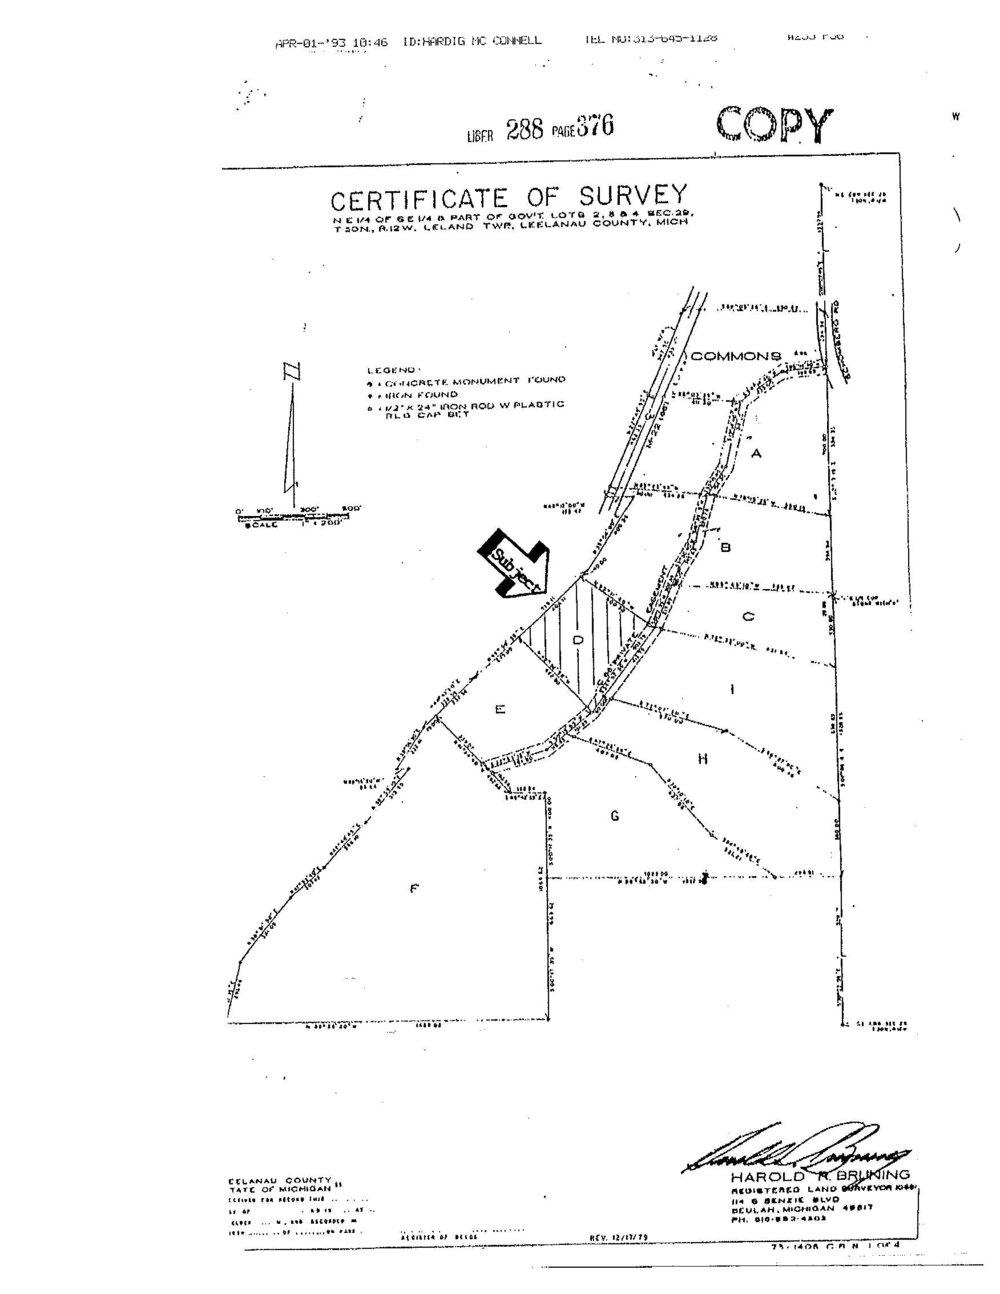 564 S Woodsmoke Drive, Lake Leelanau, MI – Sunset Lake Michigan Water Views - For Sale by Oltersdorf Realty - Marketing Packet (11).jpg